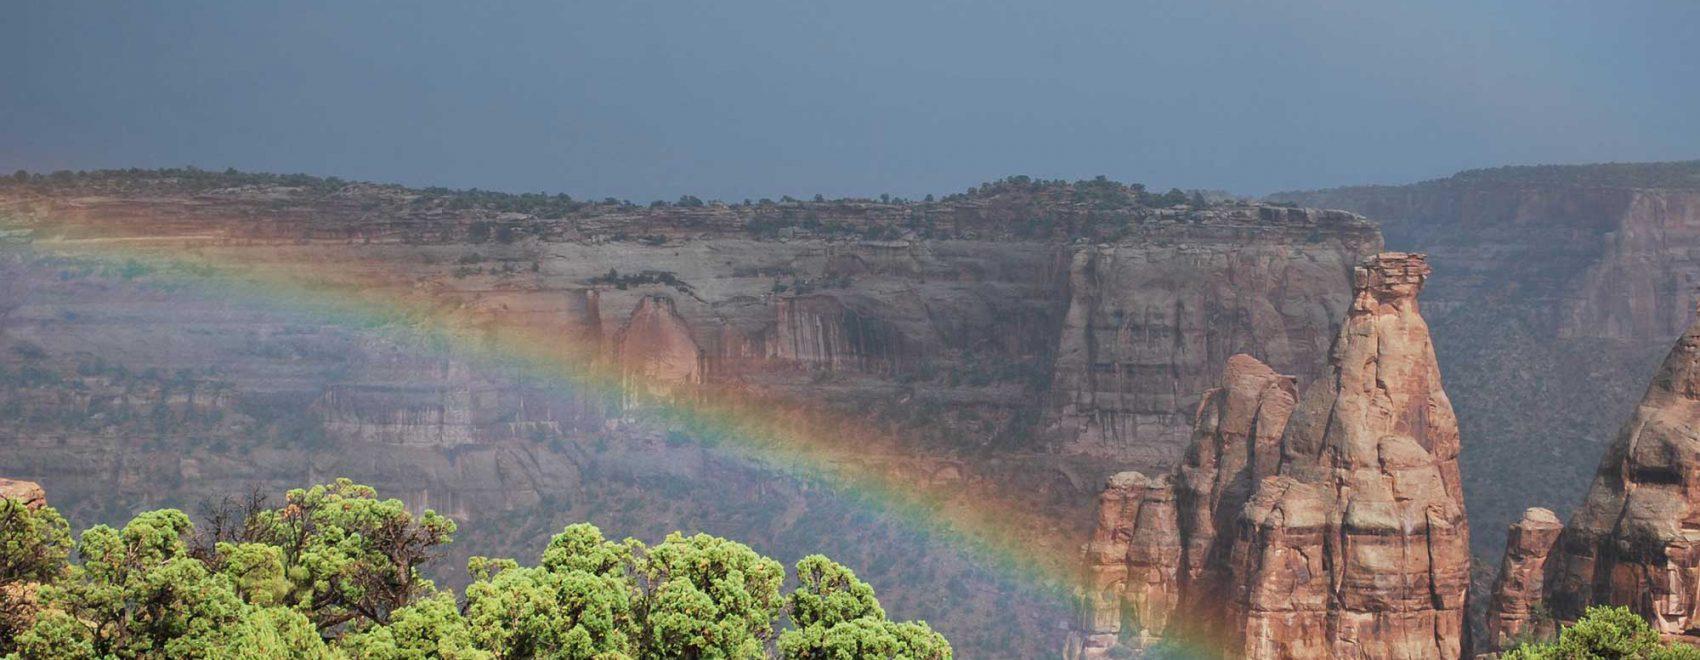 Rainbow over Colorado National Monument